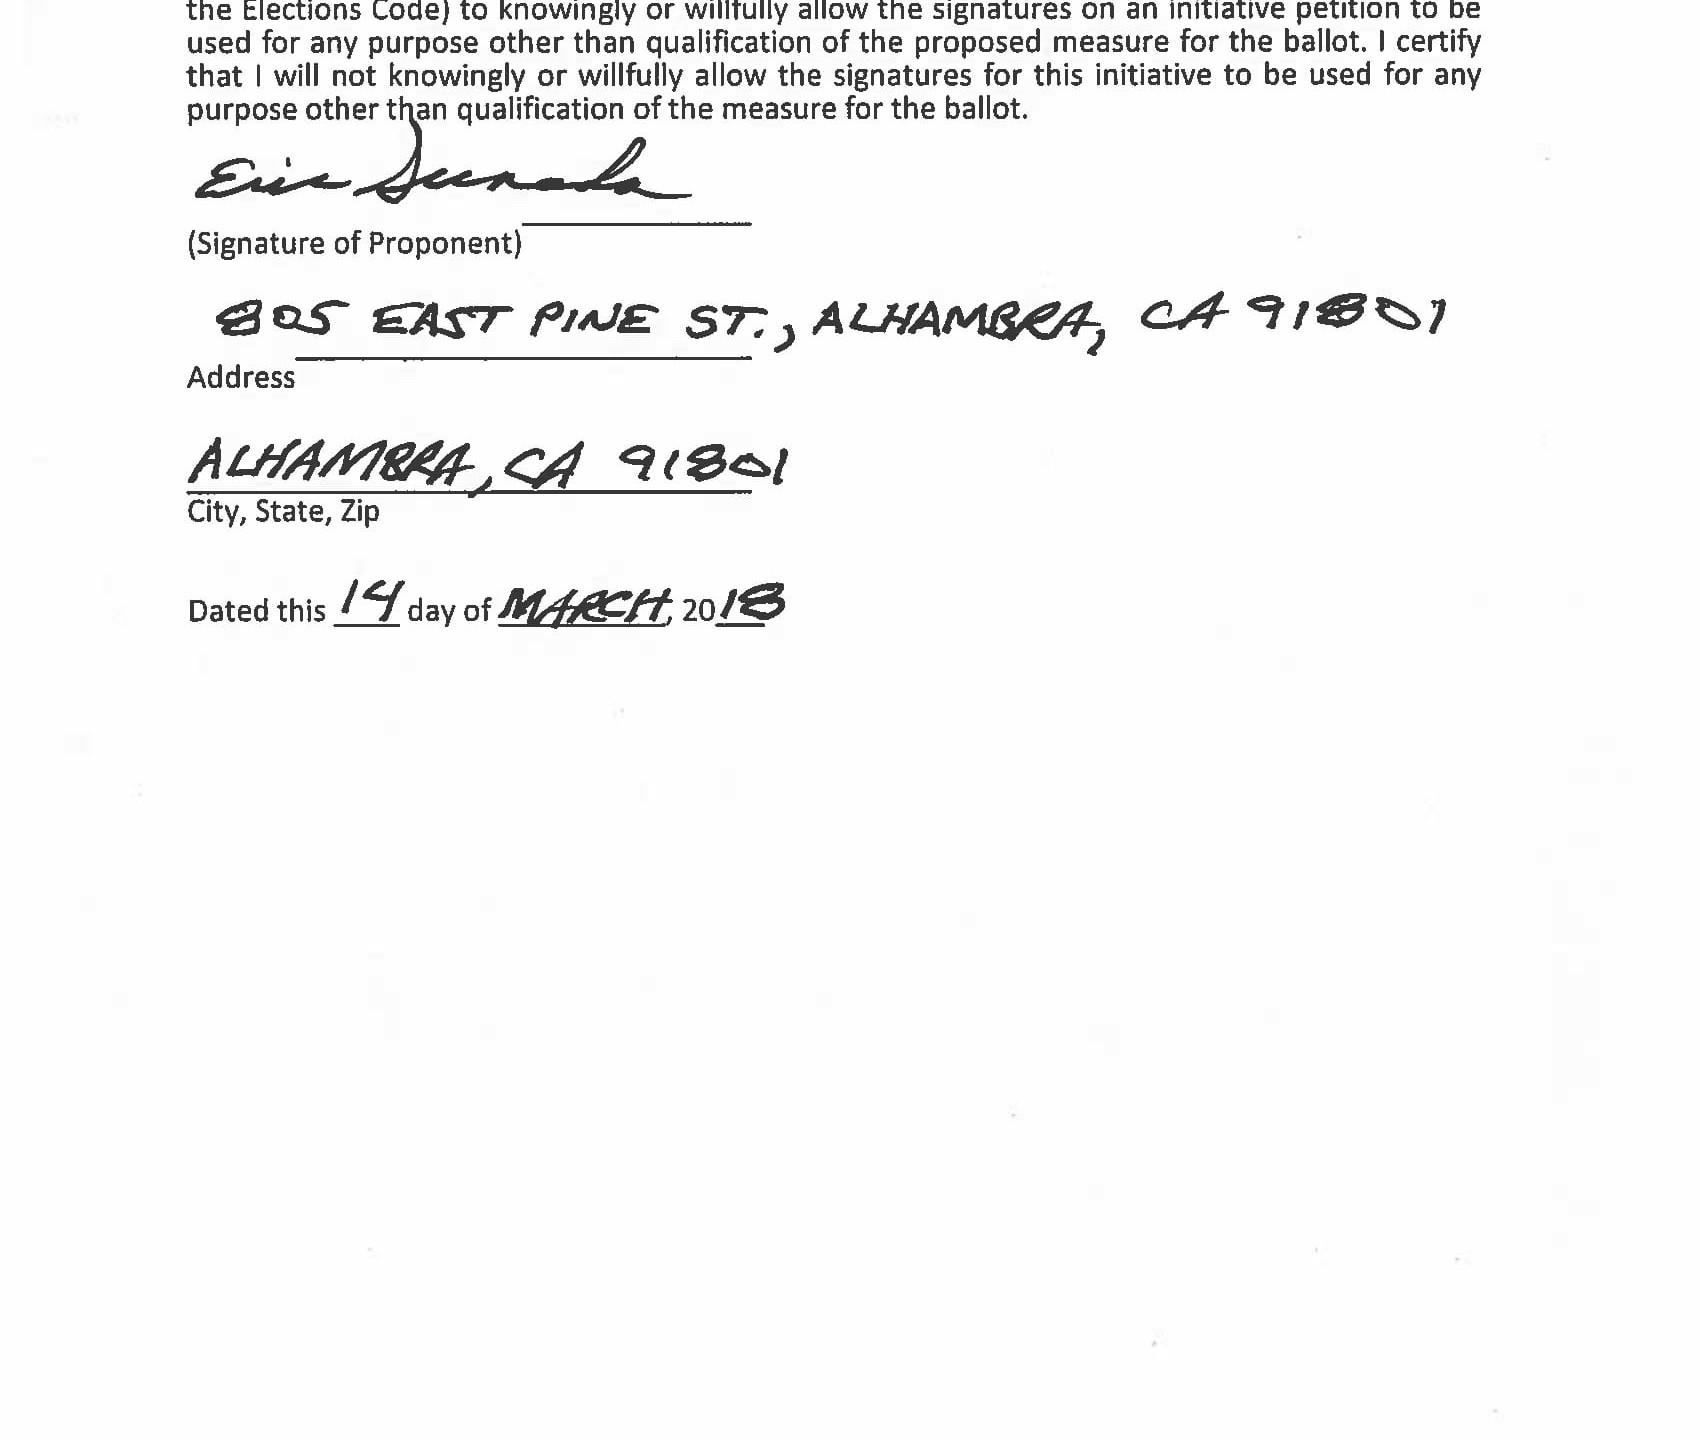 Initiative paperwork stamped by city clerk-02